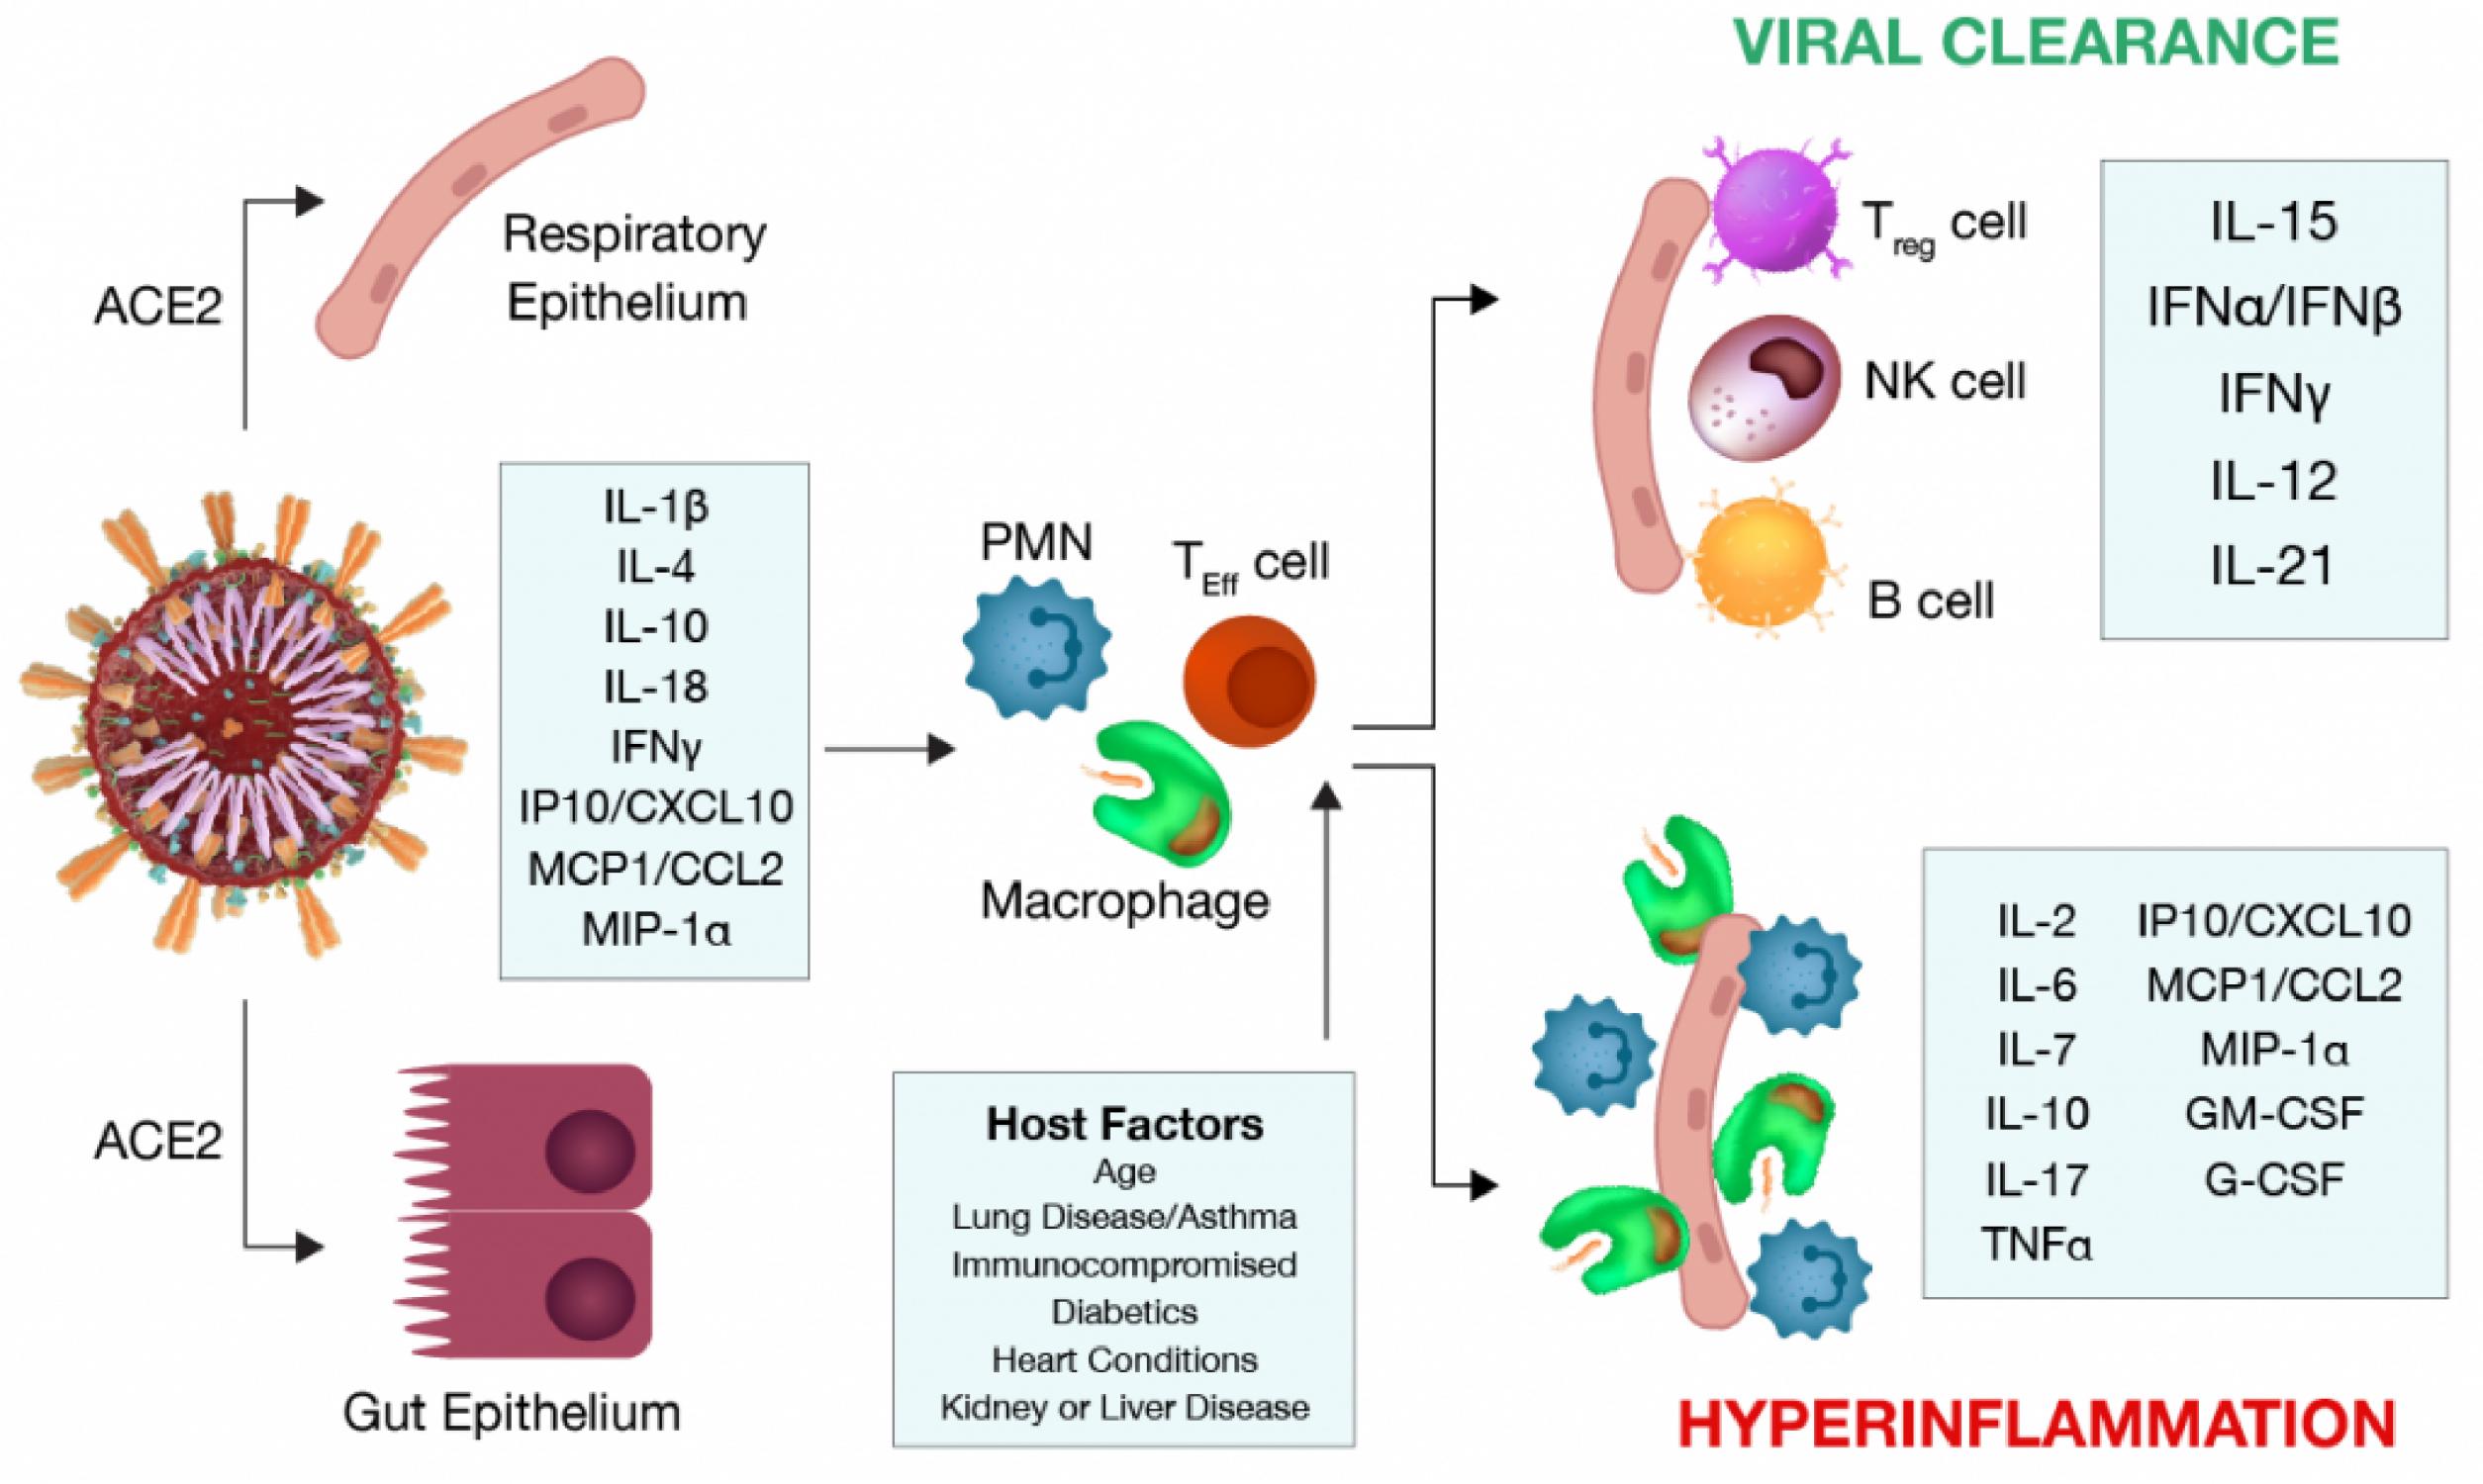 SARS-CoV-2 Cytokine Response